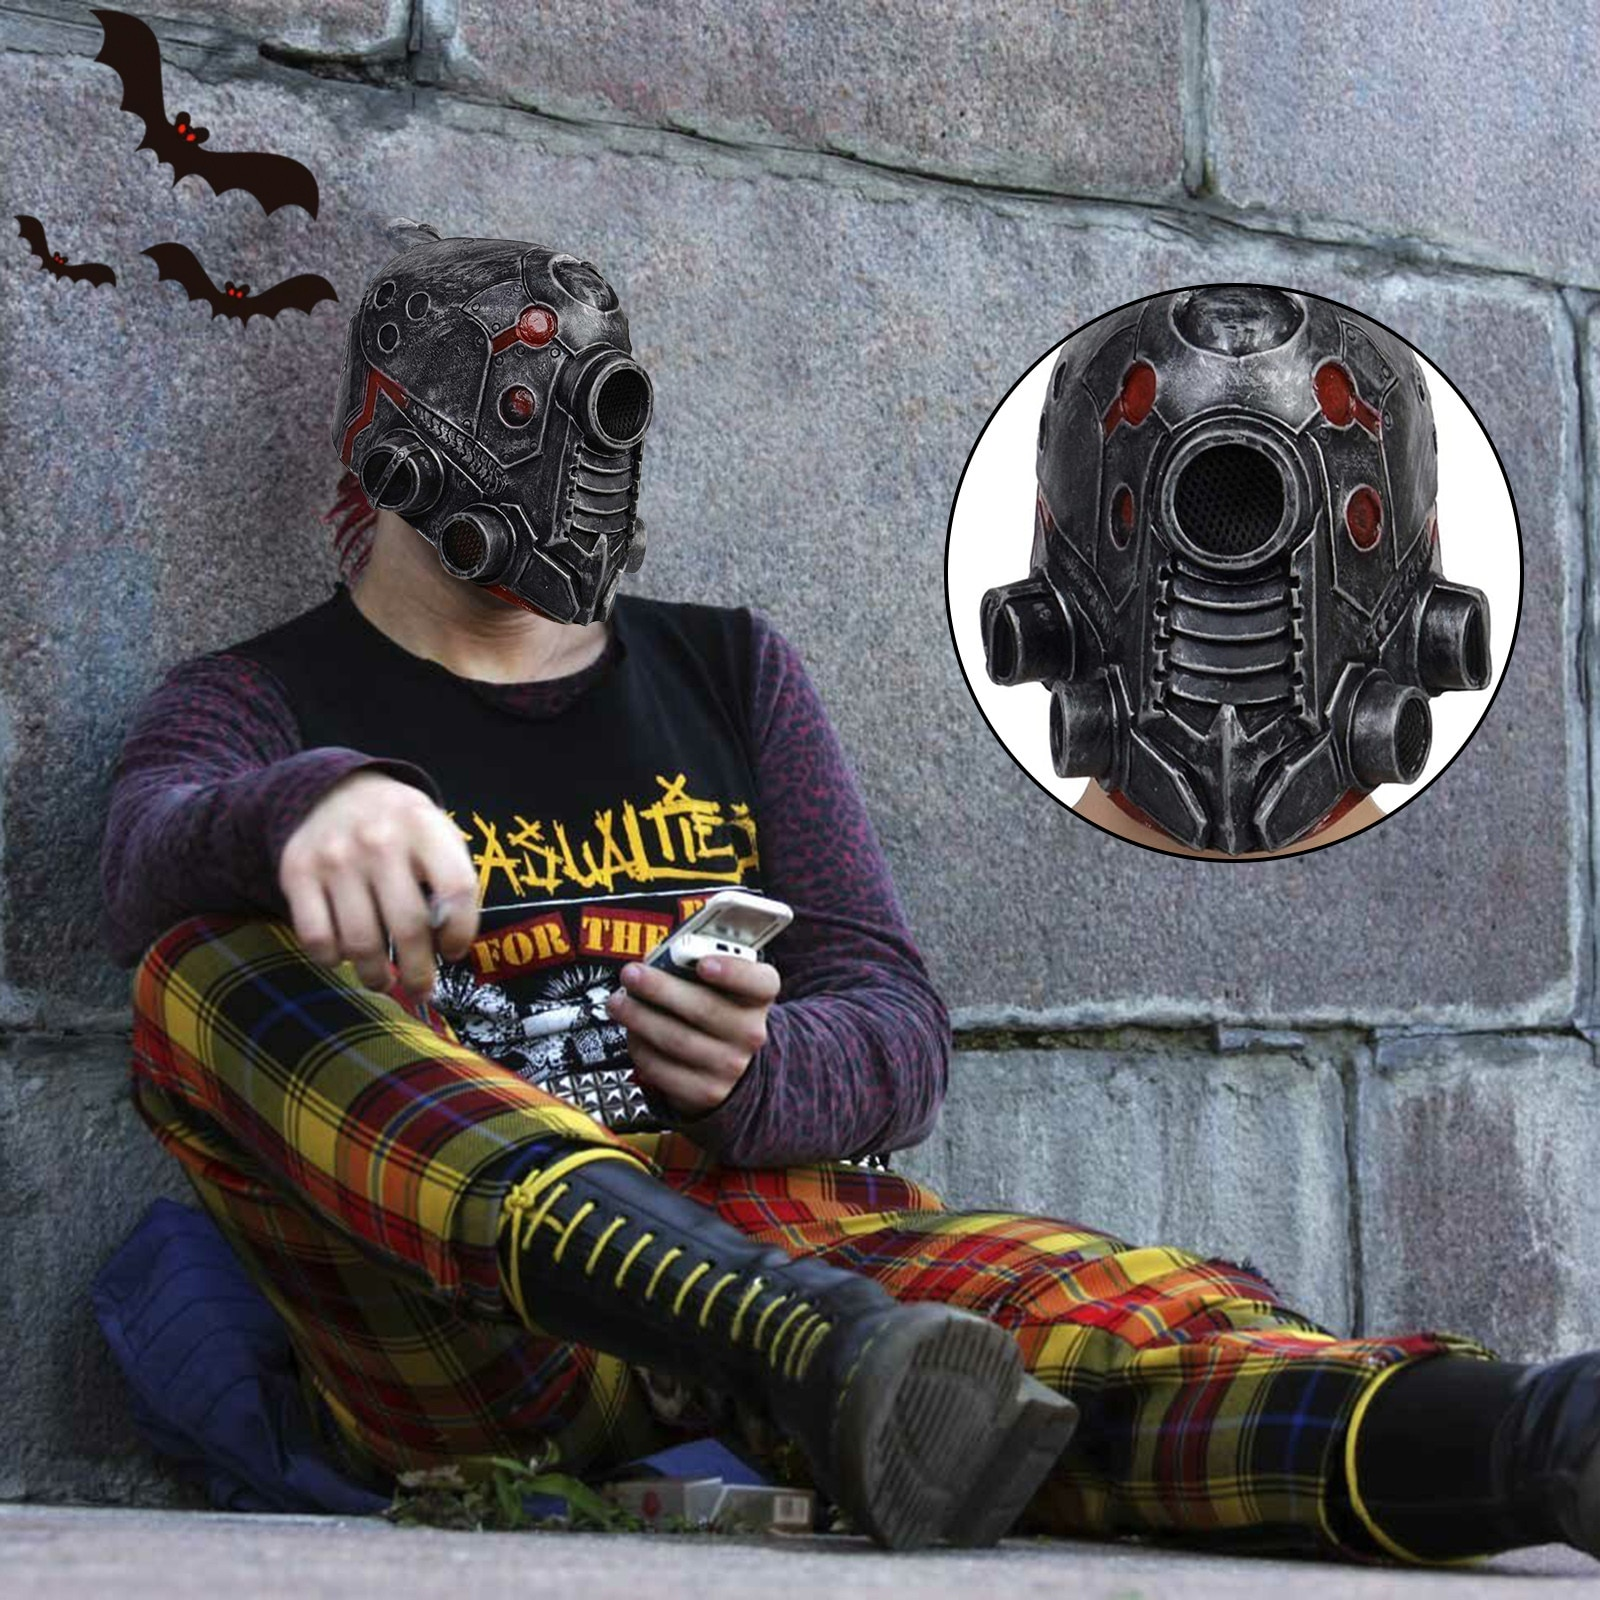 Robot Cyberpunkes Steampunk Mask Cosplay Prop Halloween Masque Helmet Latex Full Head Mask Party Costume Horror Mask Masquerade